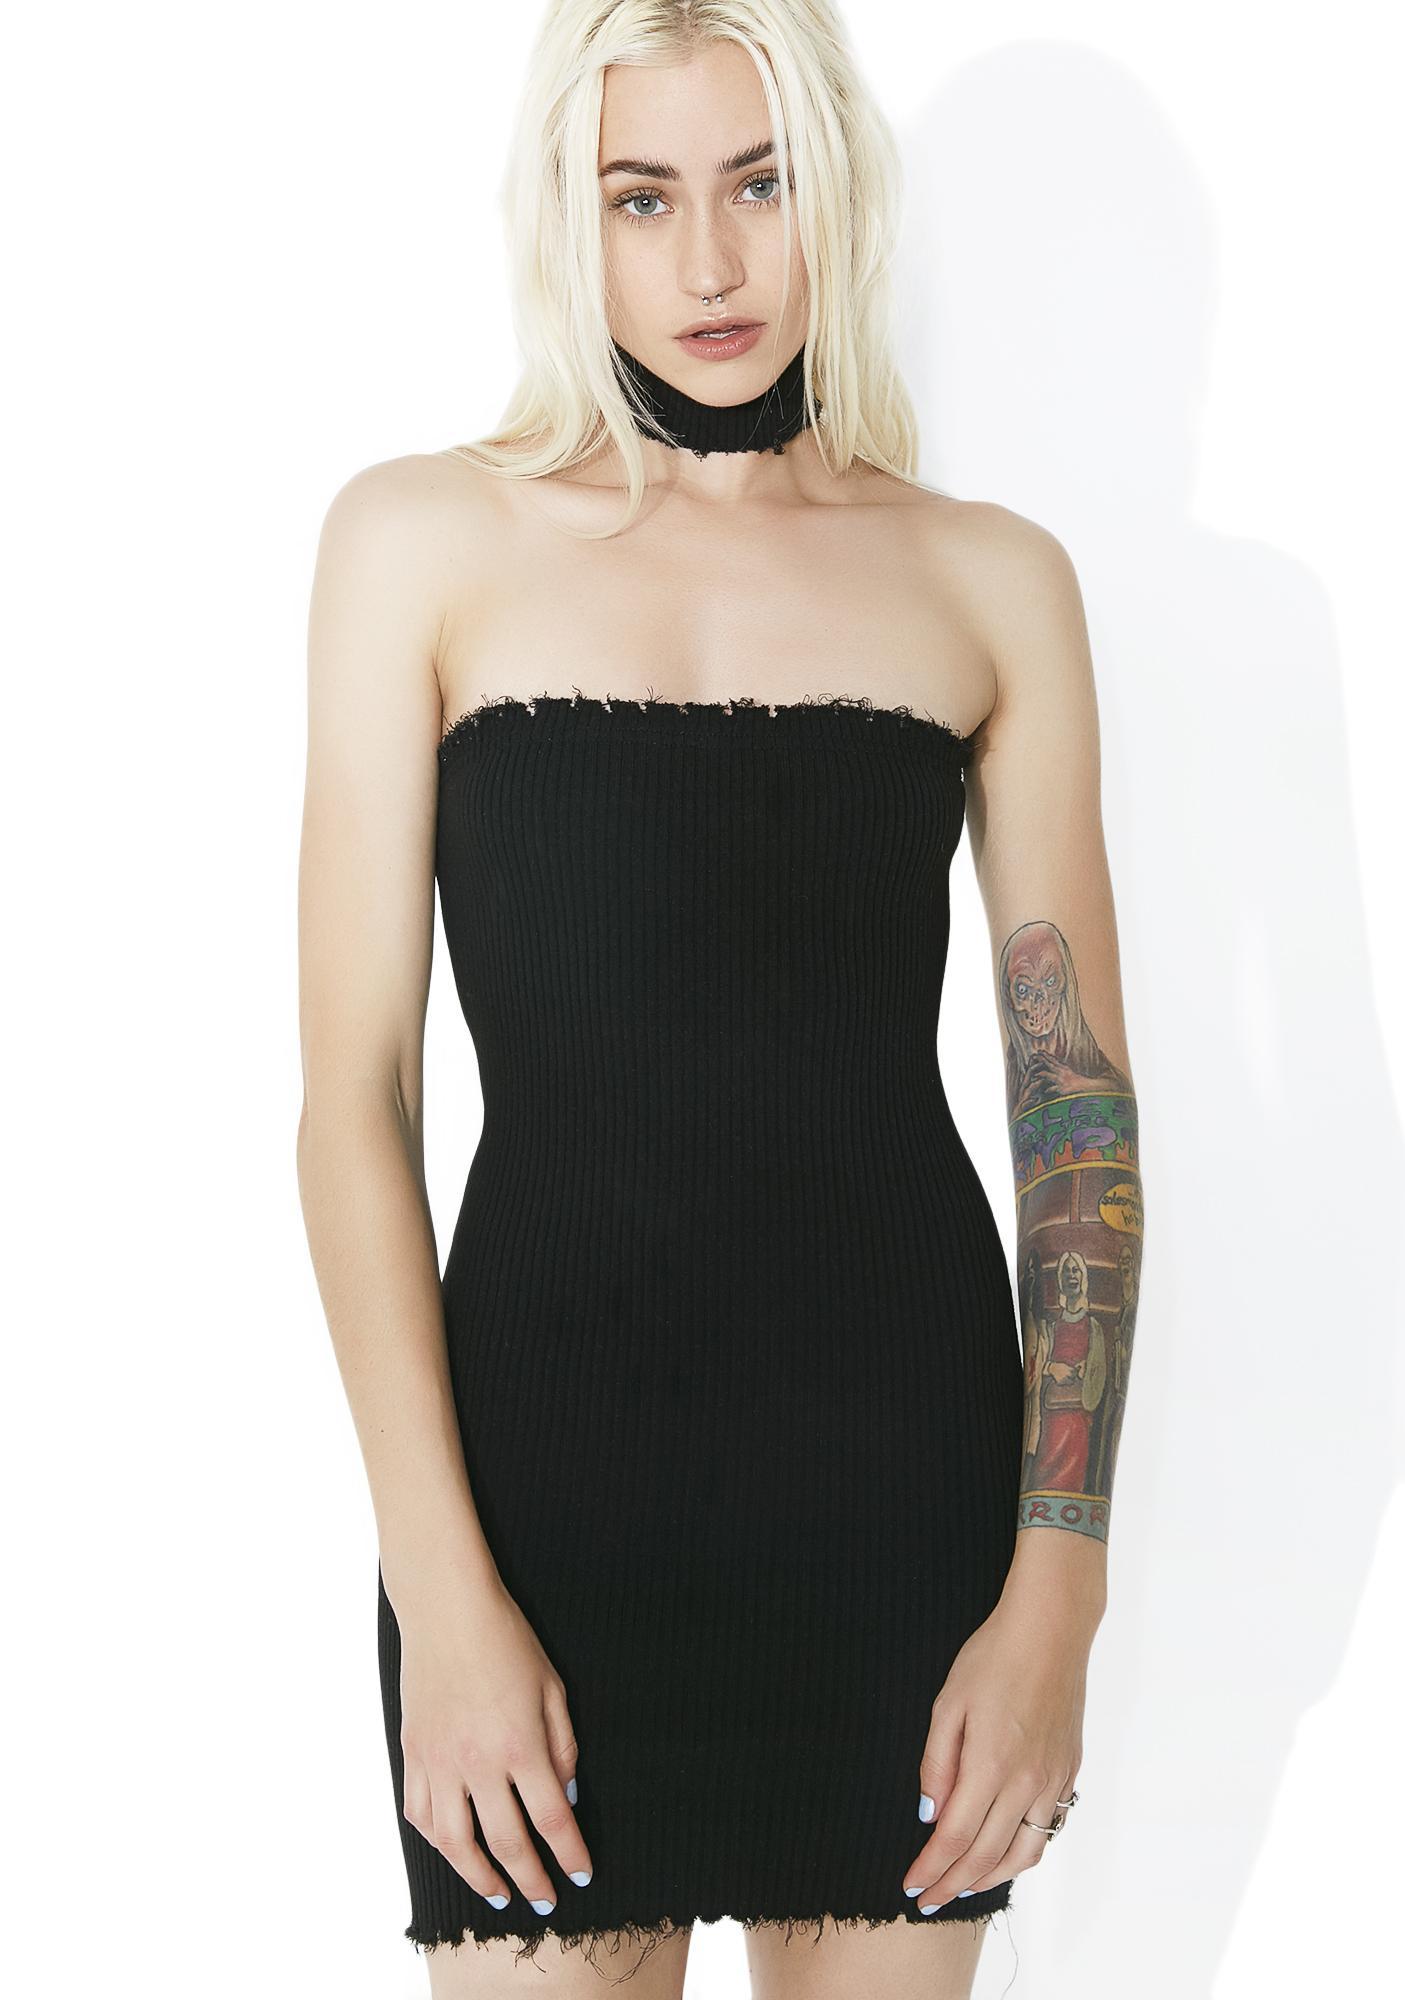 Fashion style Black little tube dress for lady